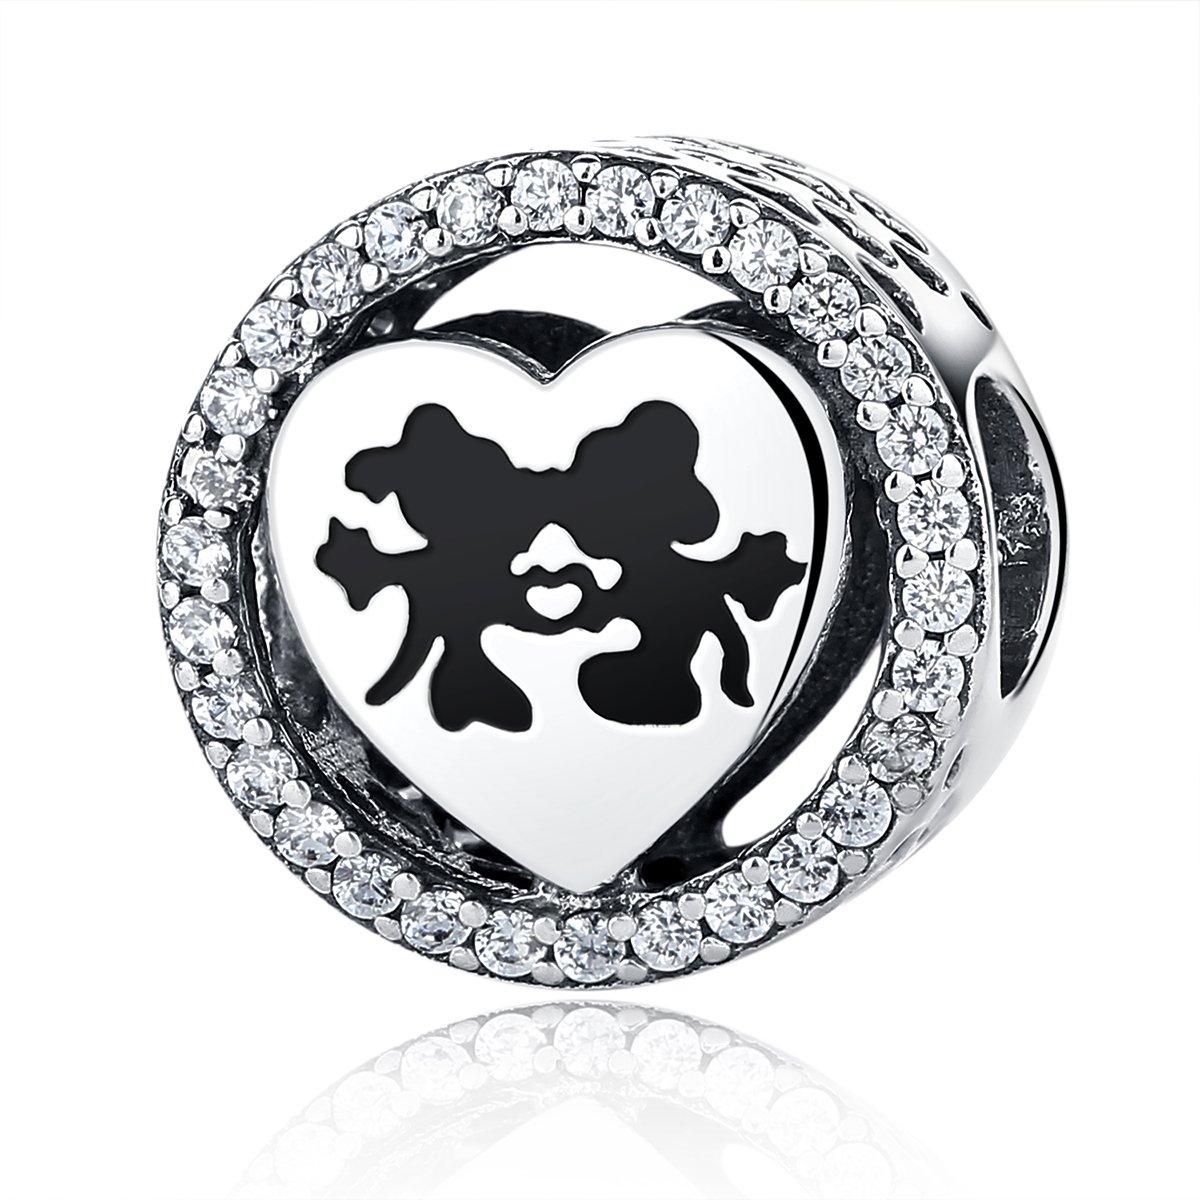 NINGAN Disney, Mickey & Minnie Love, Charm Clear CZ 925 Sterling Silver Charms Fit Pandora & Other European Charm